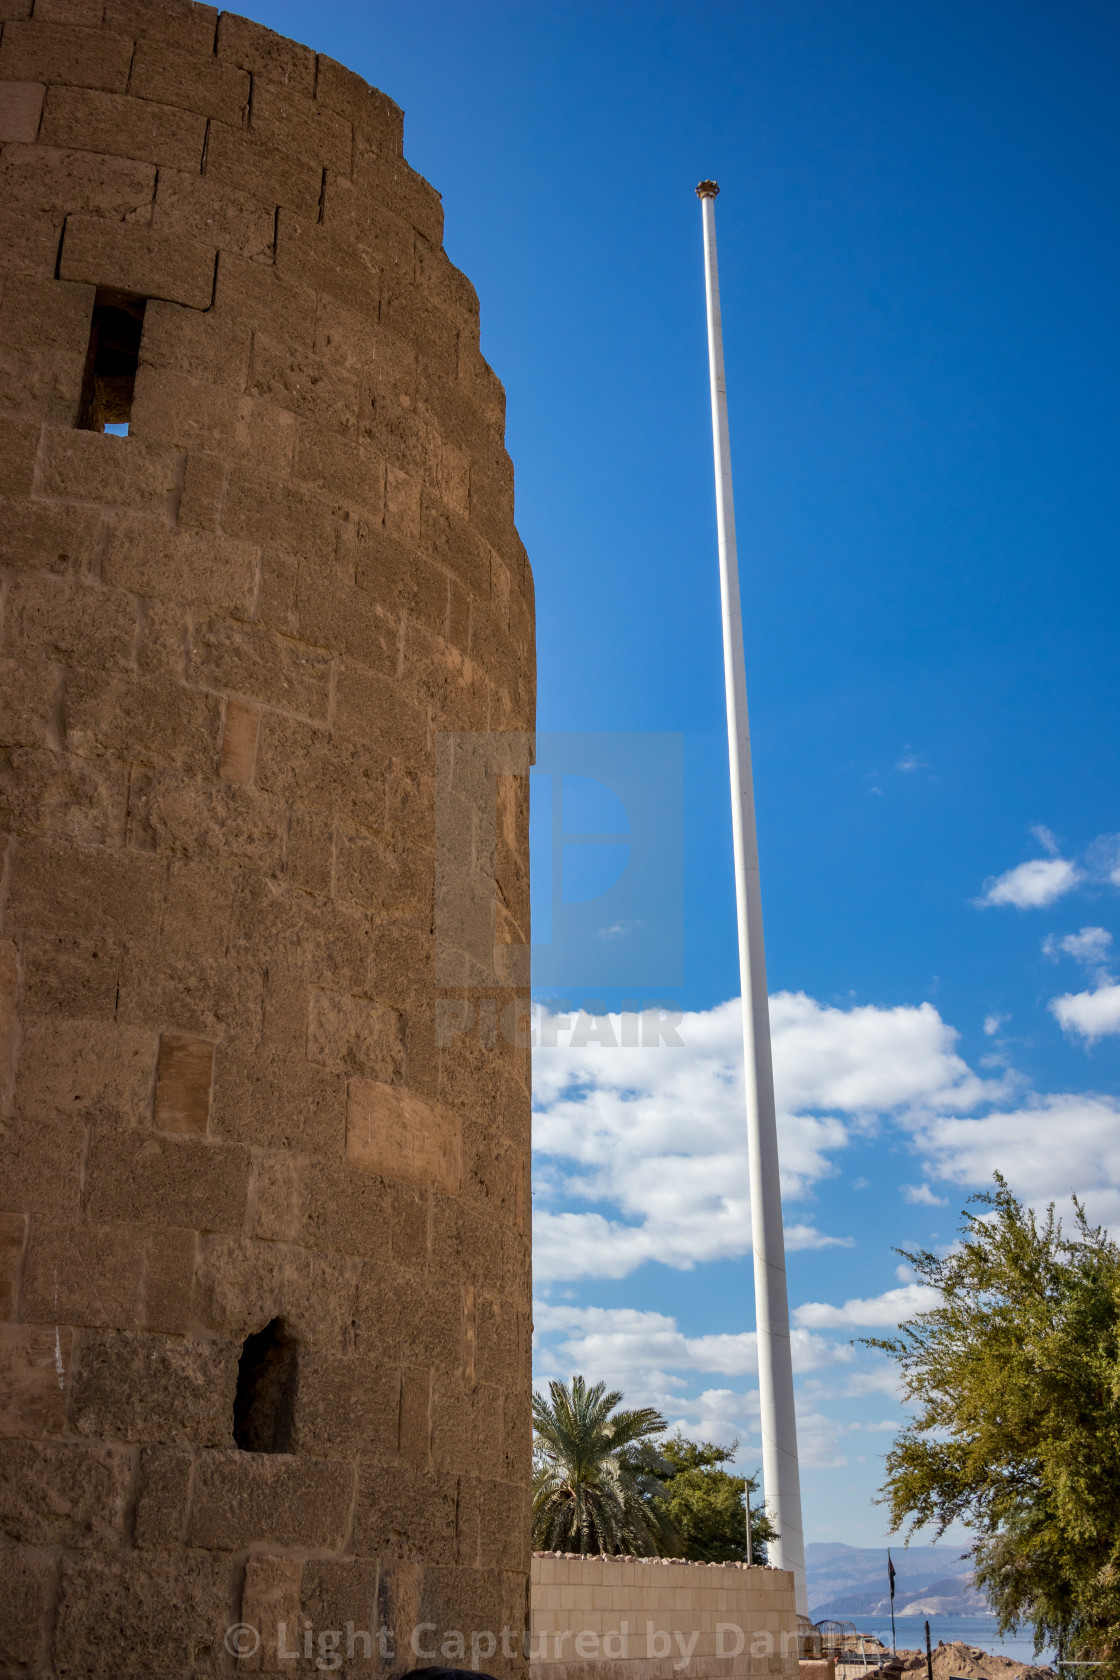 """Jordan, Aqaba, old city castle fort tower"" stock image"